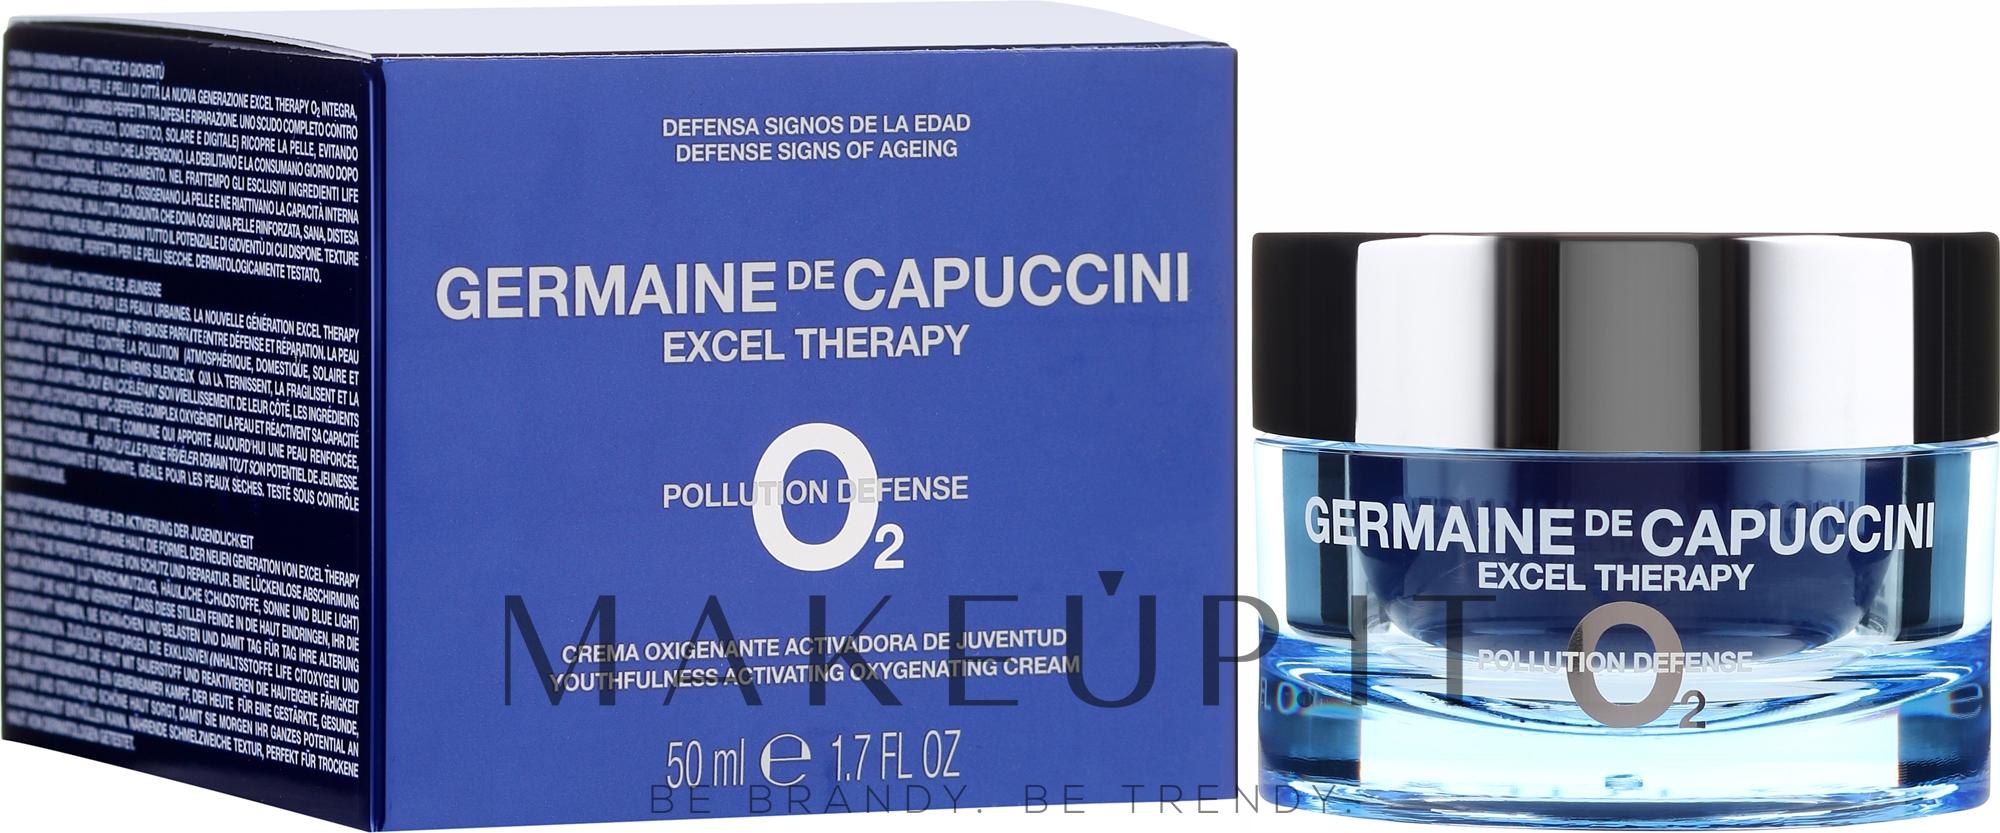 Crema viso rigenerante - Germaine de Capuccini Excel Therapy O? Pollution Defence Youth.Activating Oxygenating Cream — foto 50 ml